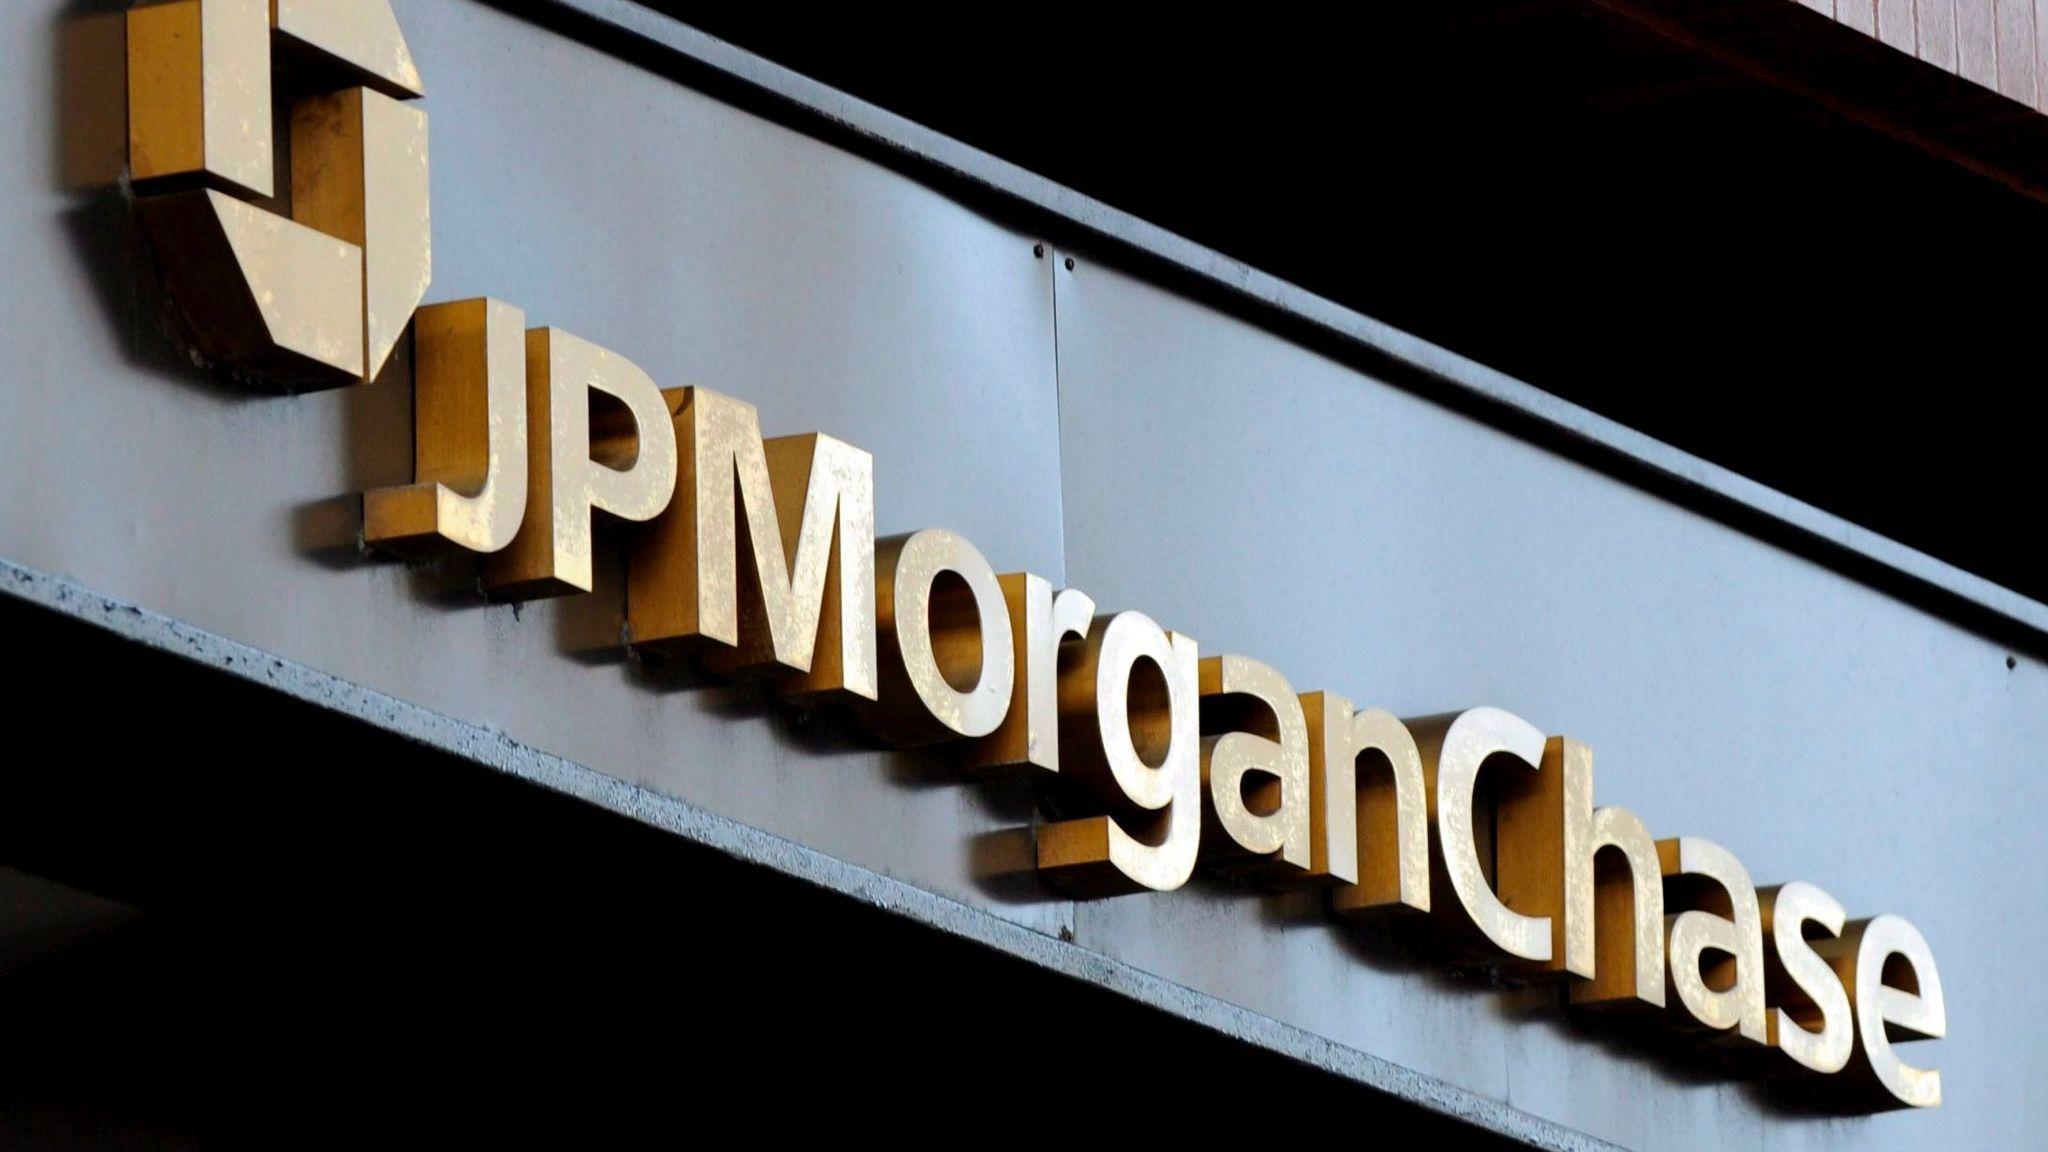 JPMorgan settles allegations of mortgage discrimination against minorities